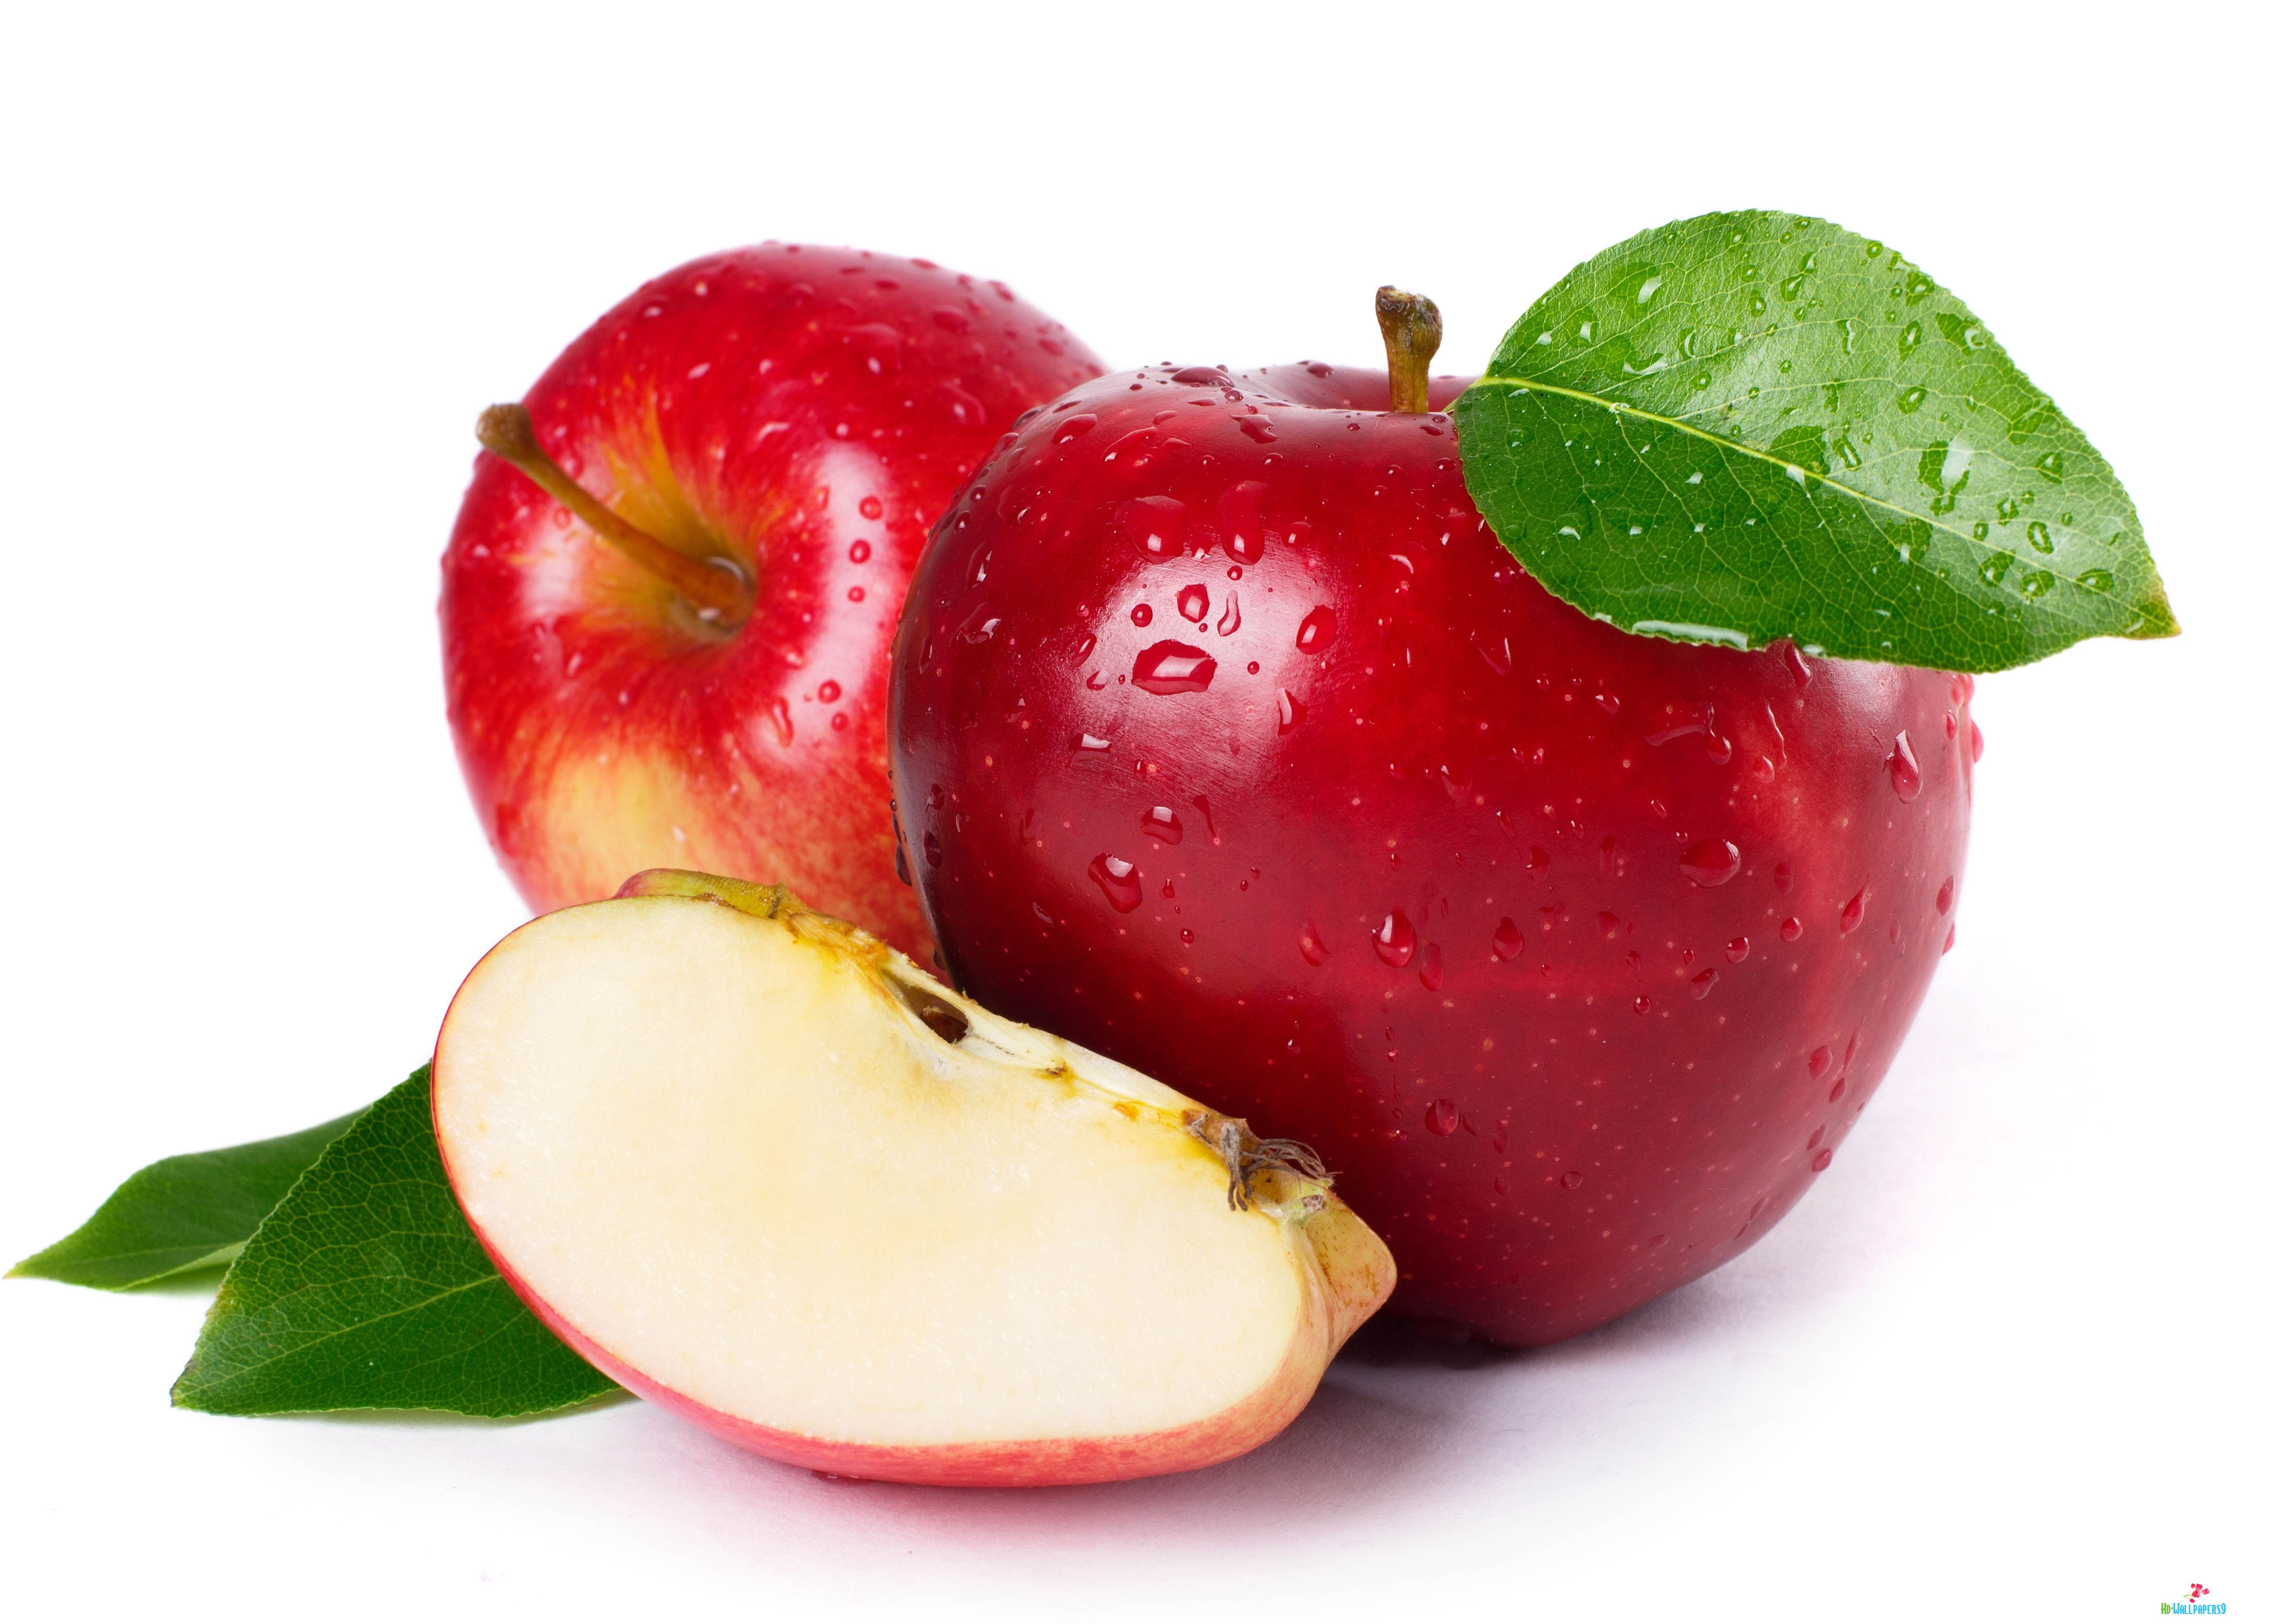 Apple Fruit Wallpaper hd Apple Fruit Images hd Apple 4778x3402